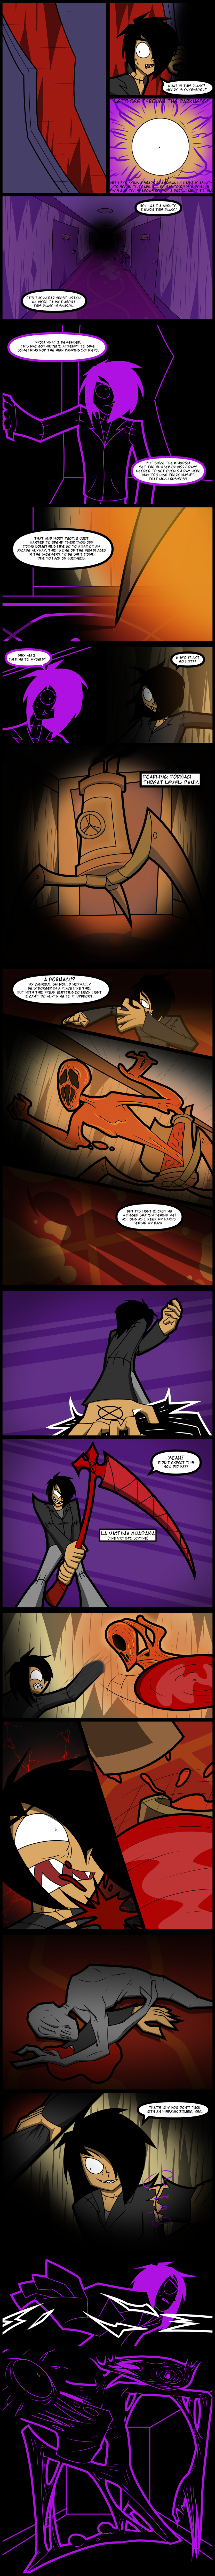 Alice Darksin - Chapter 4 Part 1